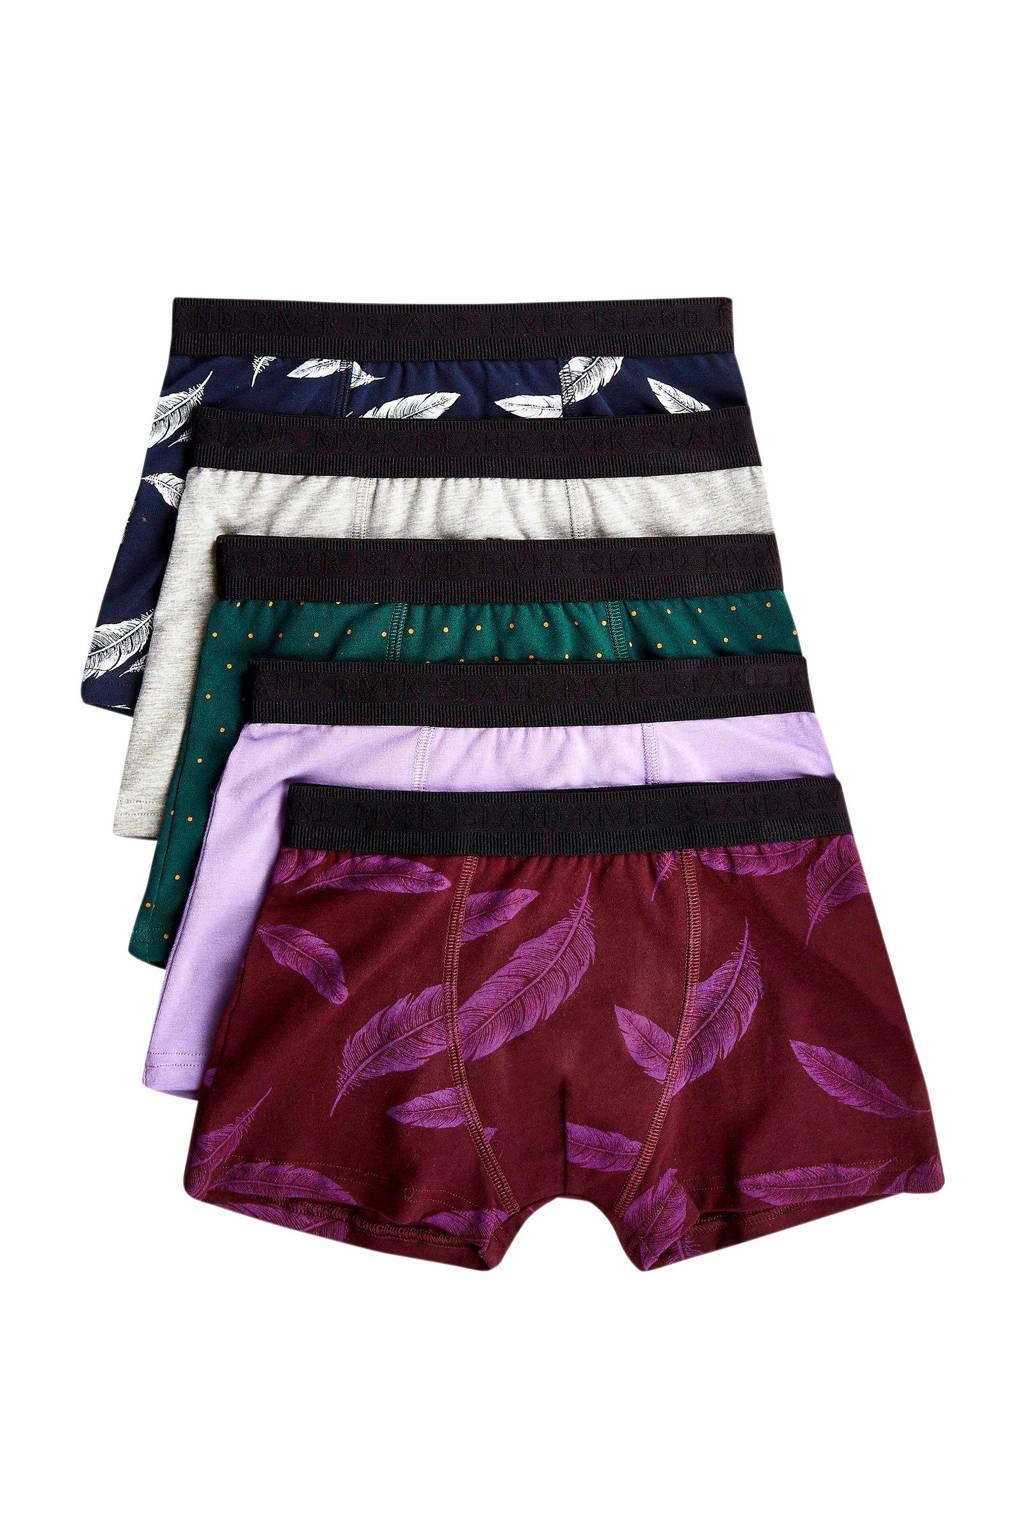 River Island Junior  boxershort (set van 5), rood/paars/groen